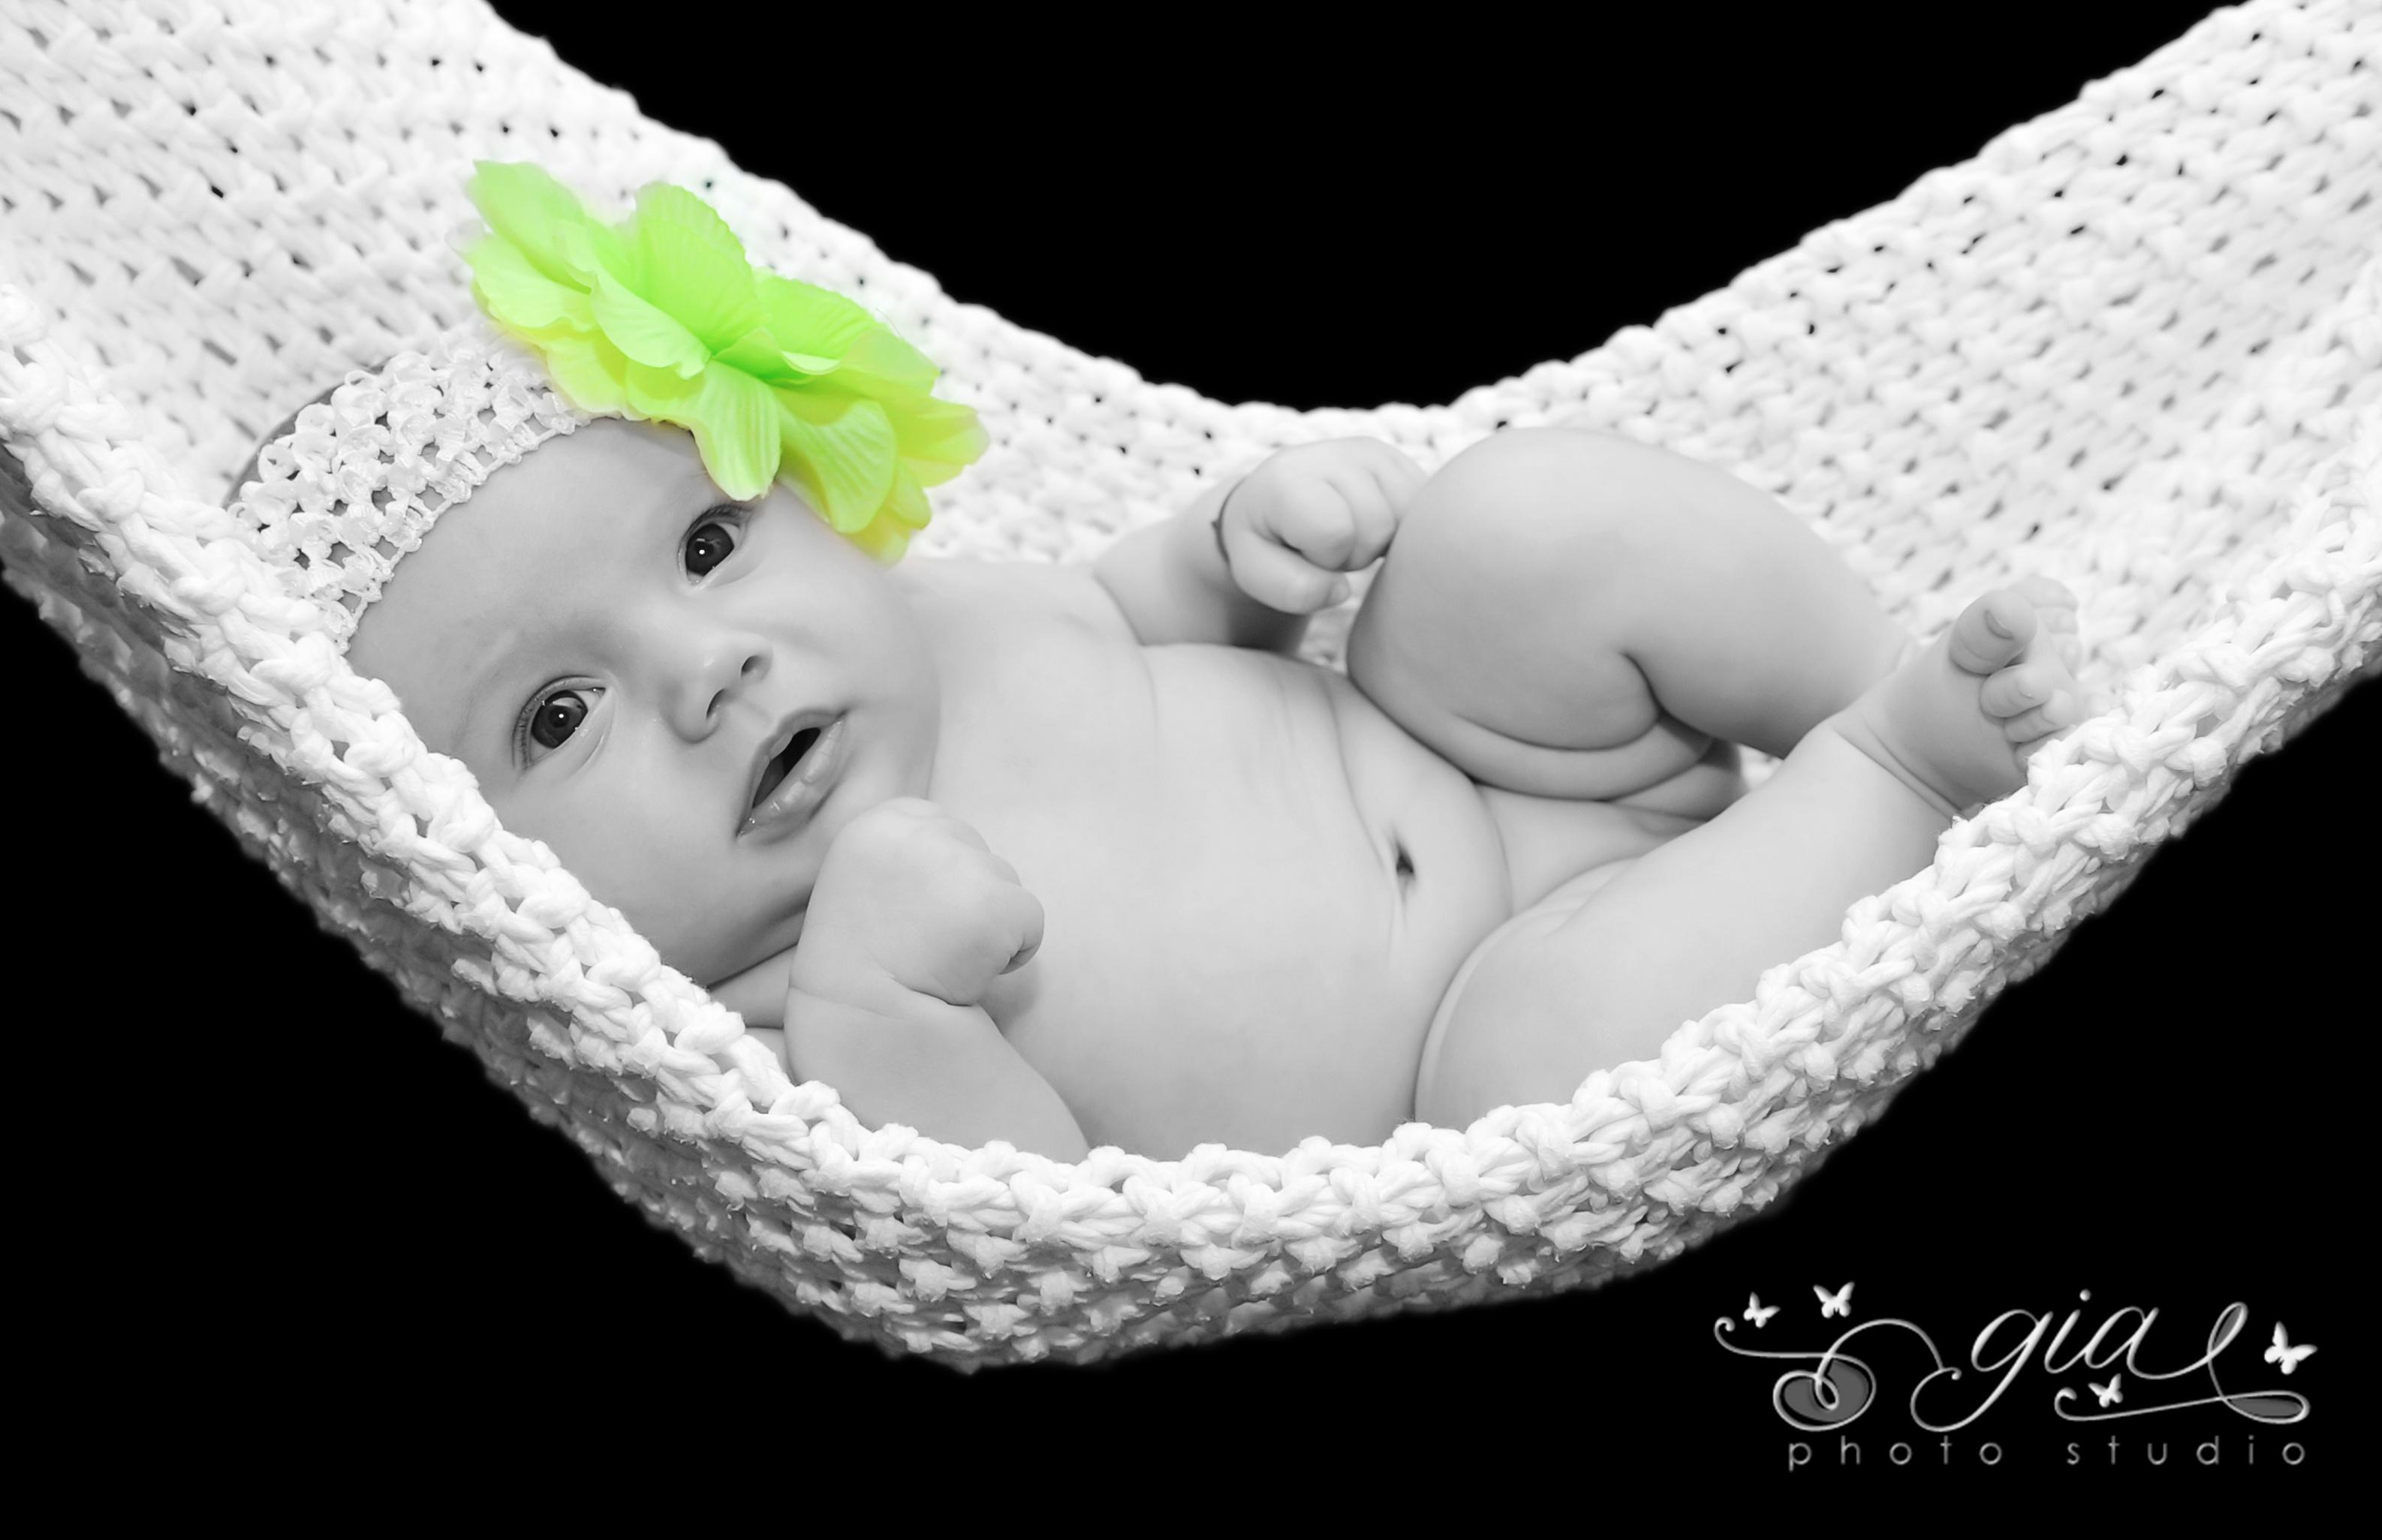 poze-cu-bebelusi-nou-nascuti-6